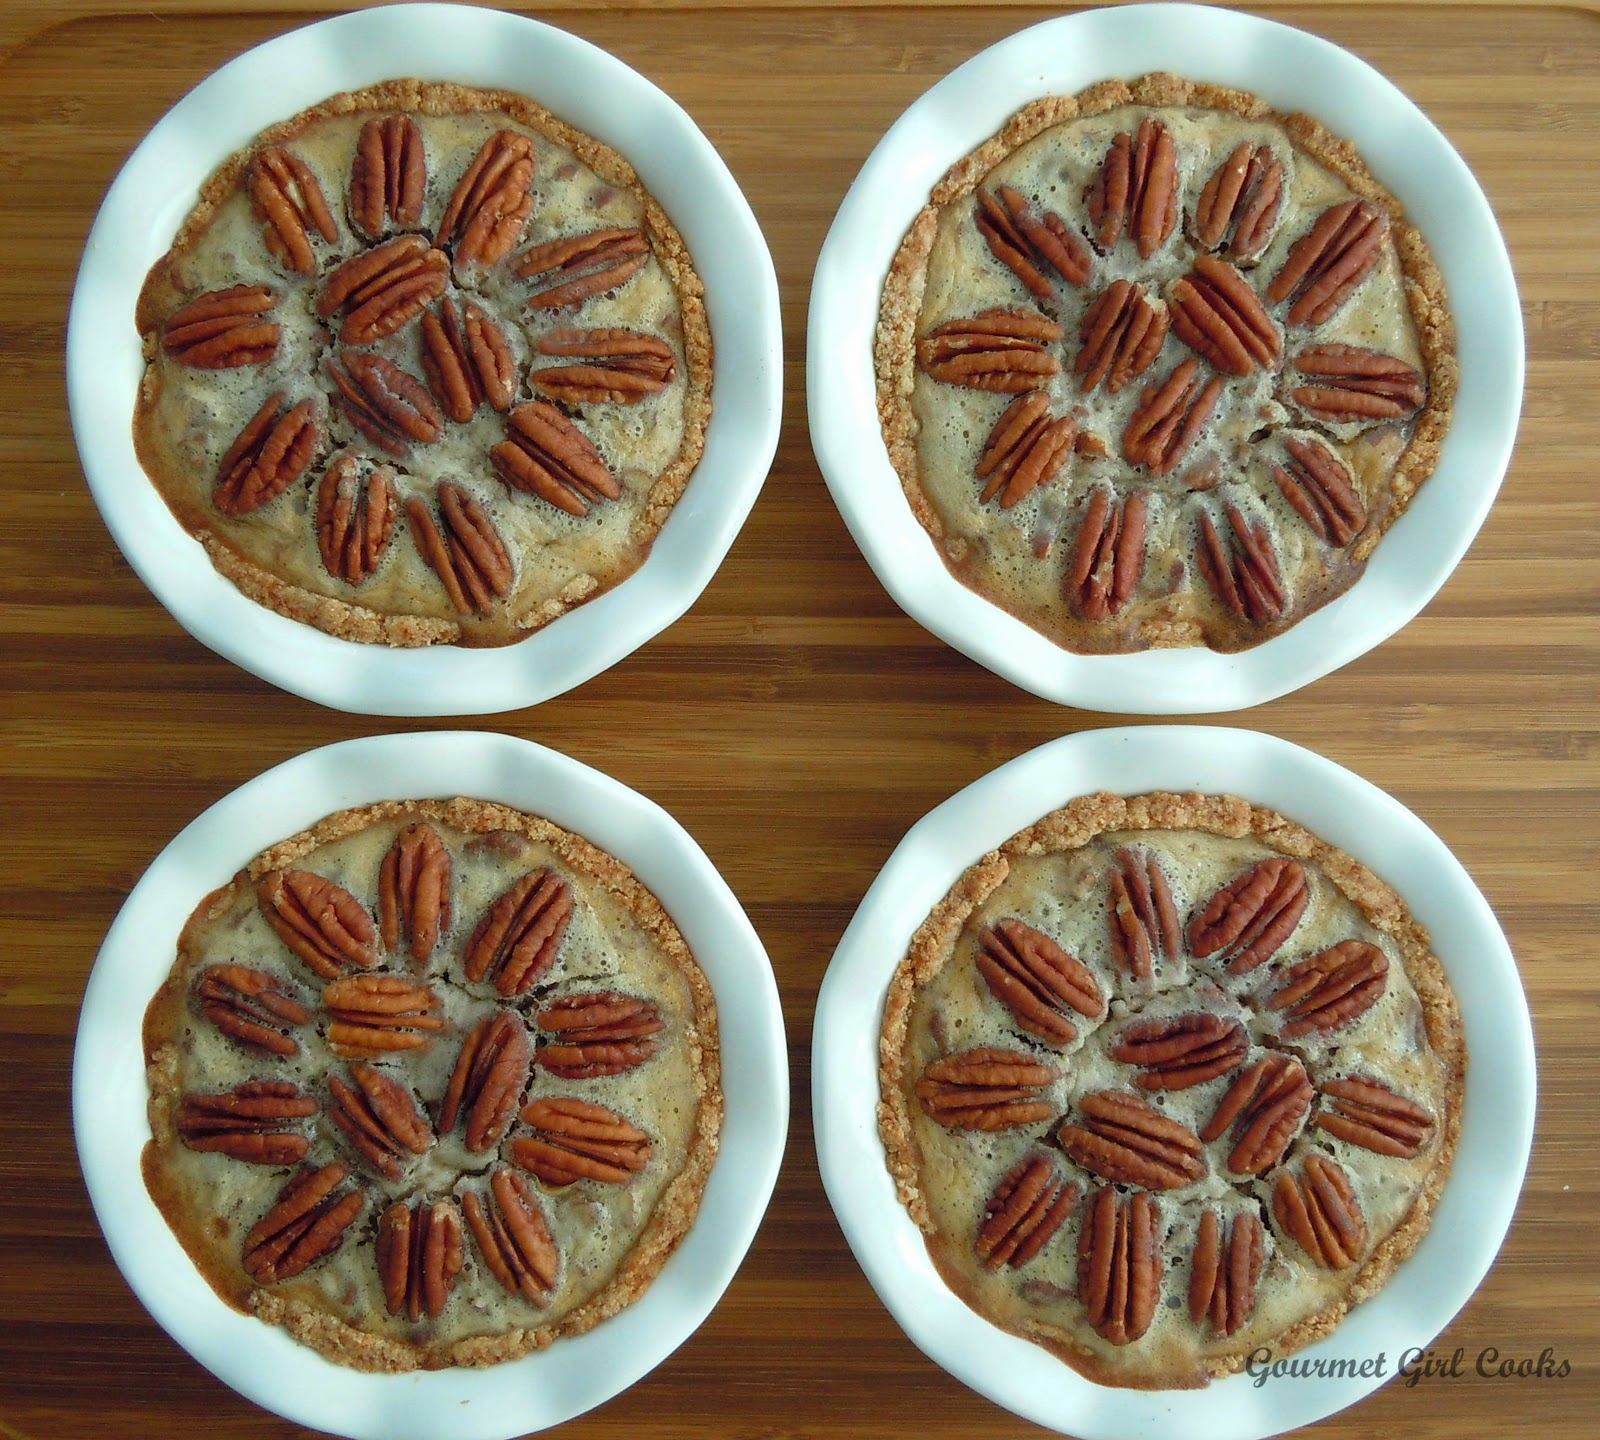 ... Girl Cooks: Pecan Pie w/ Cinnamon Almond Crust -- Wheat & Sugar Free